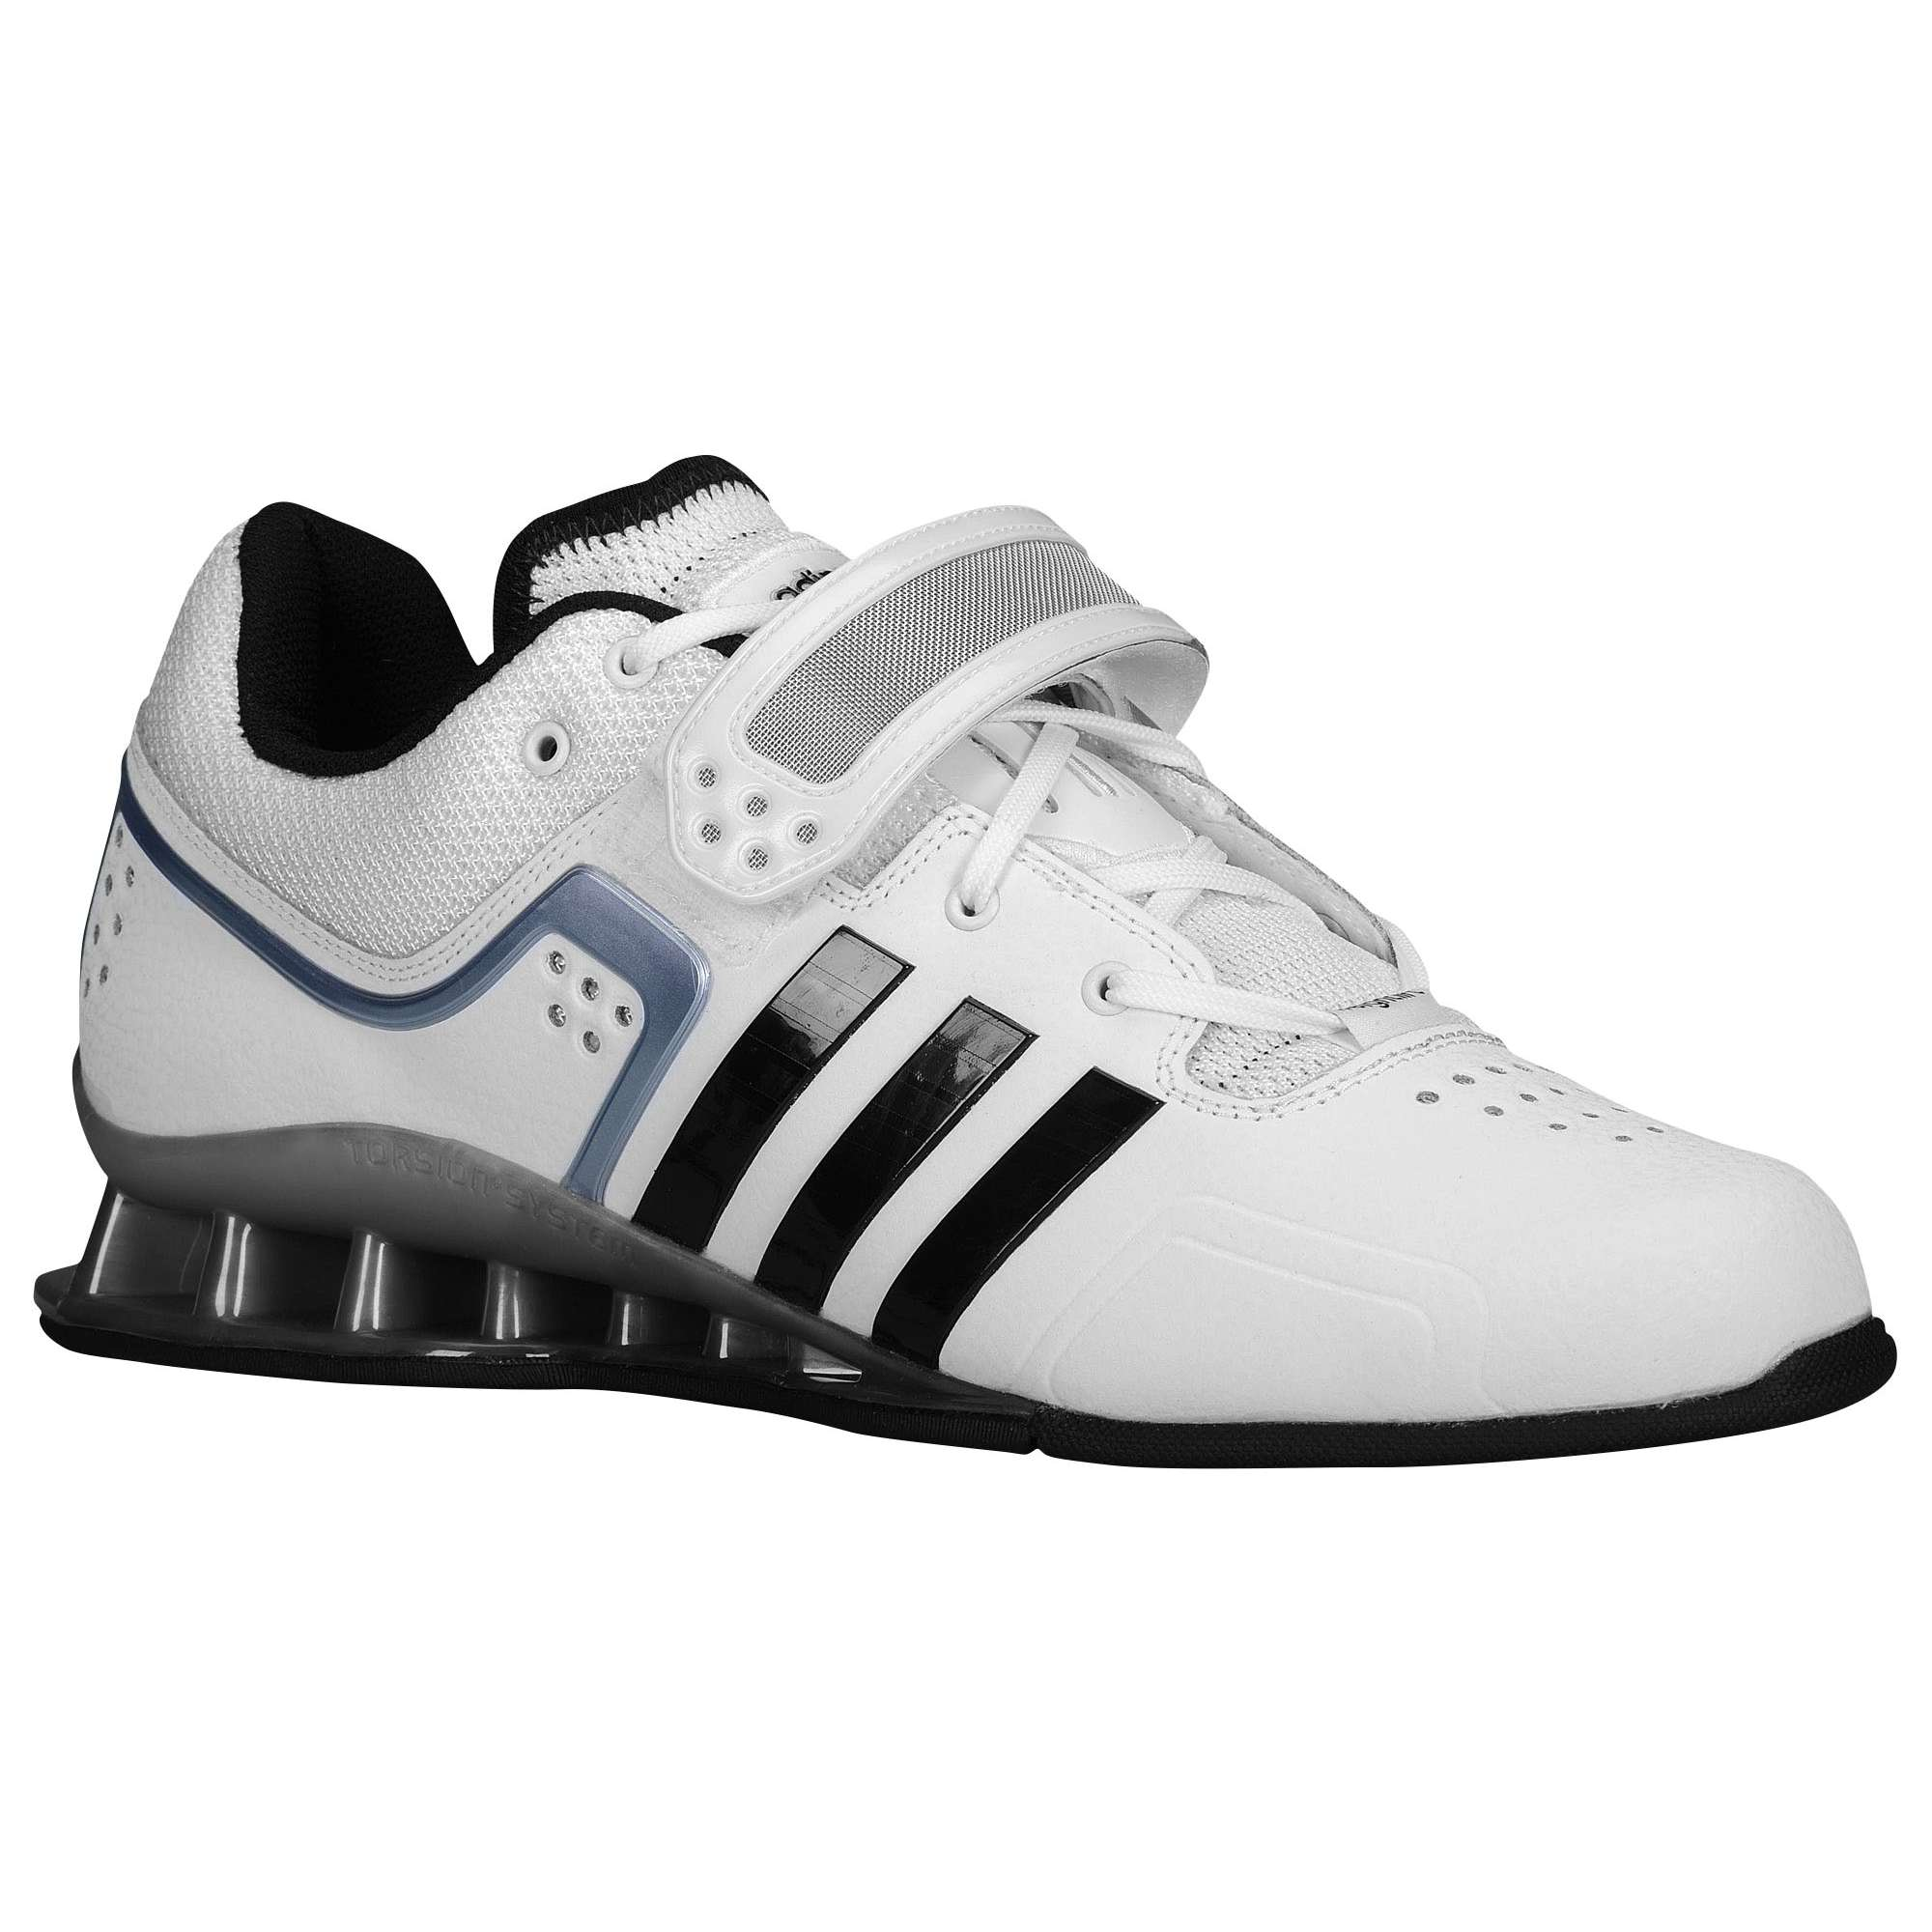 free shipping 54d51 dba3c Adidas Adipower (Wit) - Zijaanzicht ...